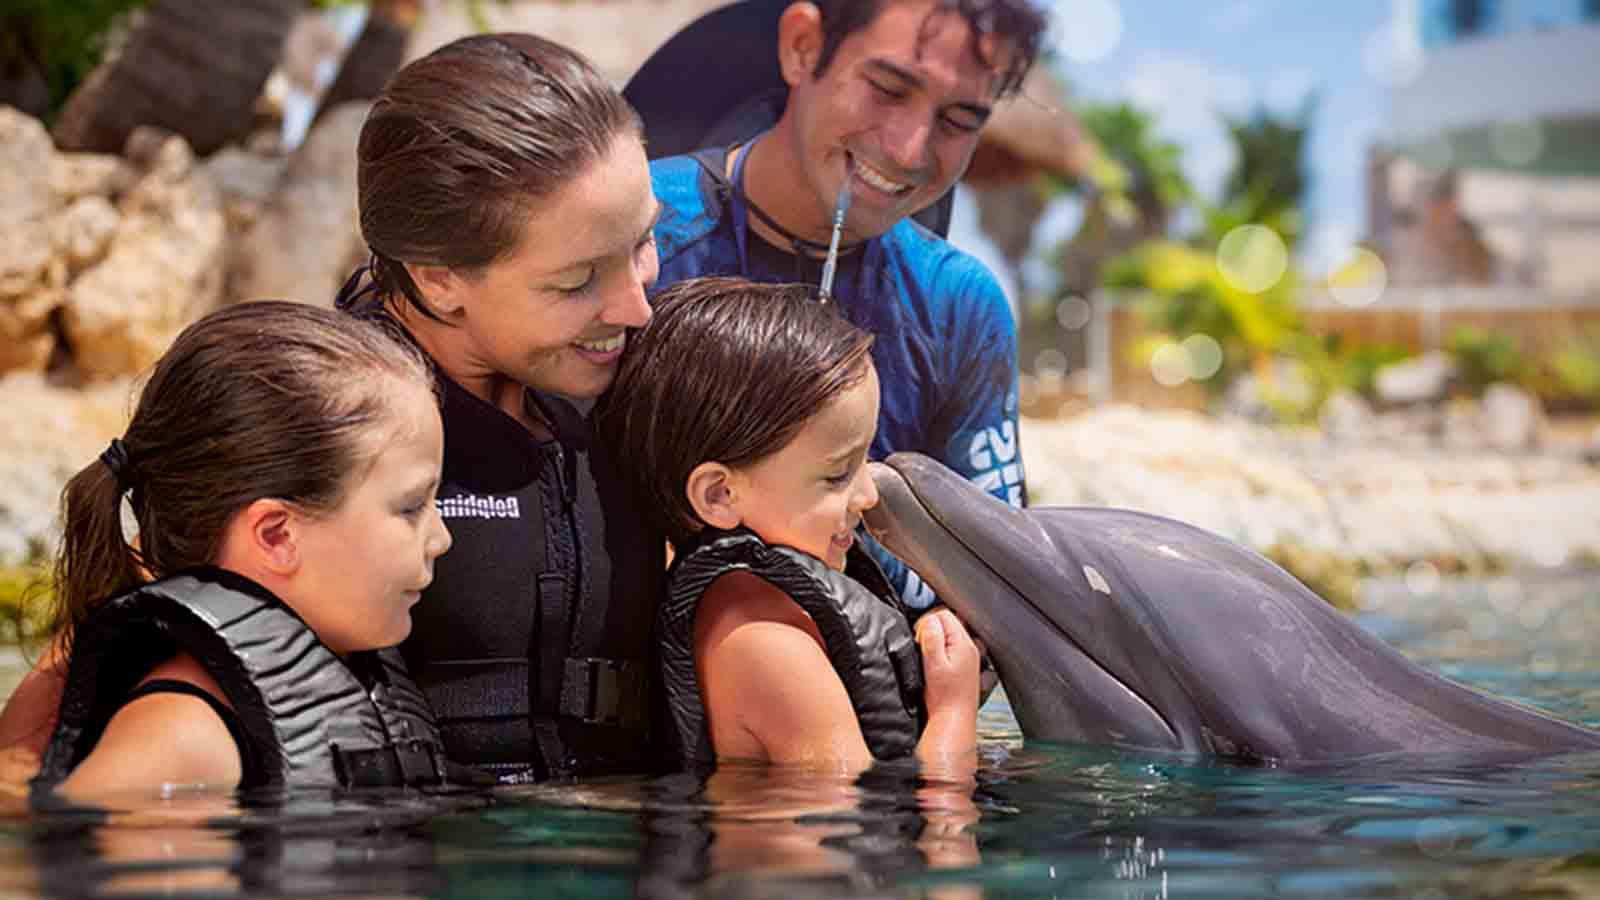 Delfines interactivo en Cozumel&IN